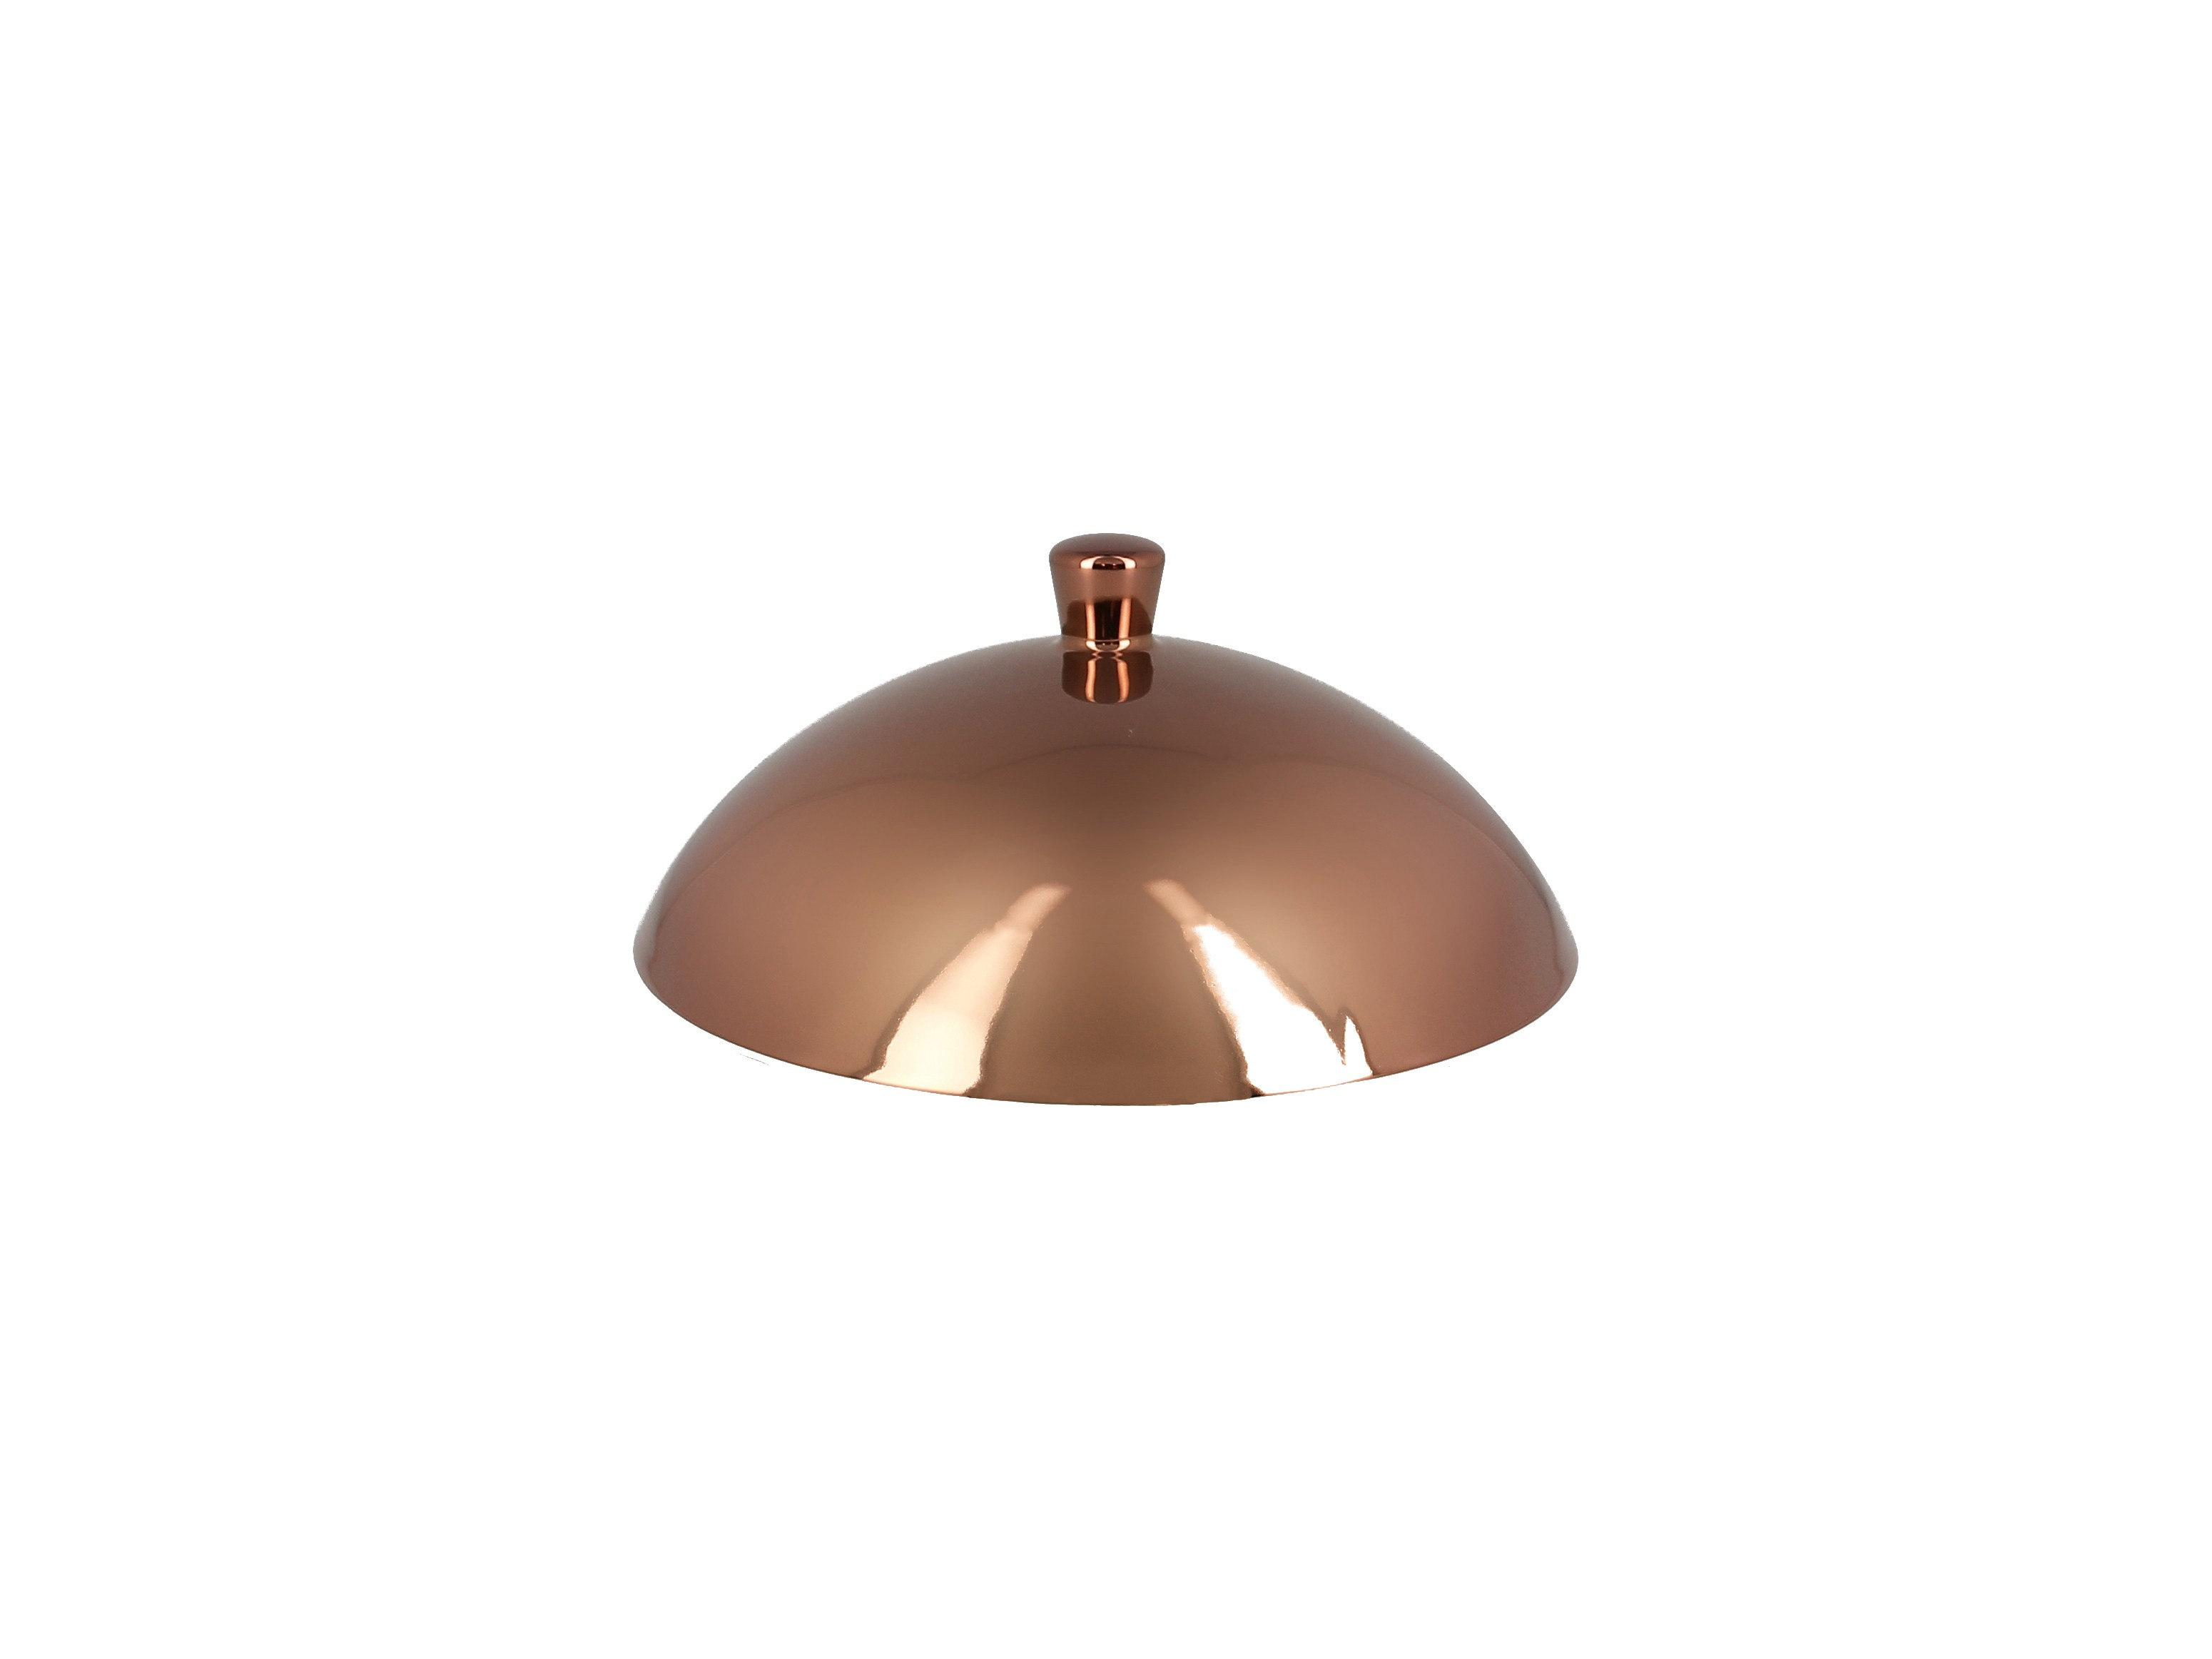 RAK | Metalfusion poklička pro talíř hluboký Gourmet pr. 13,6 cm, bronzová